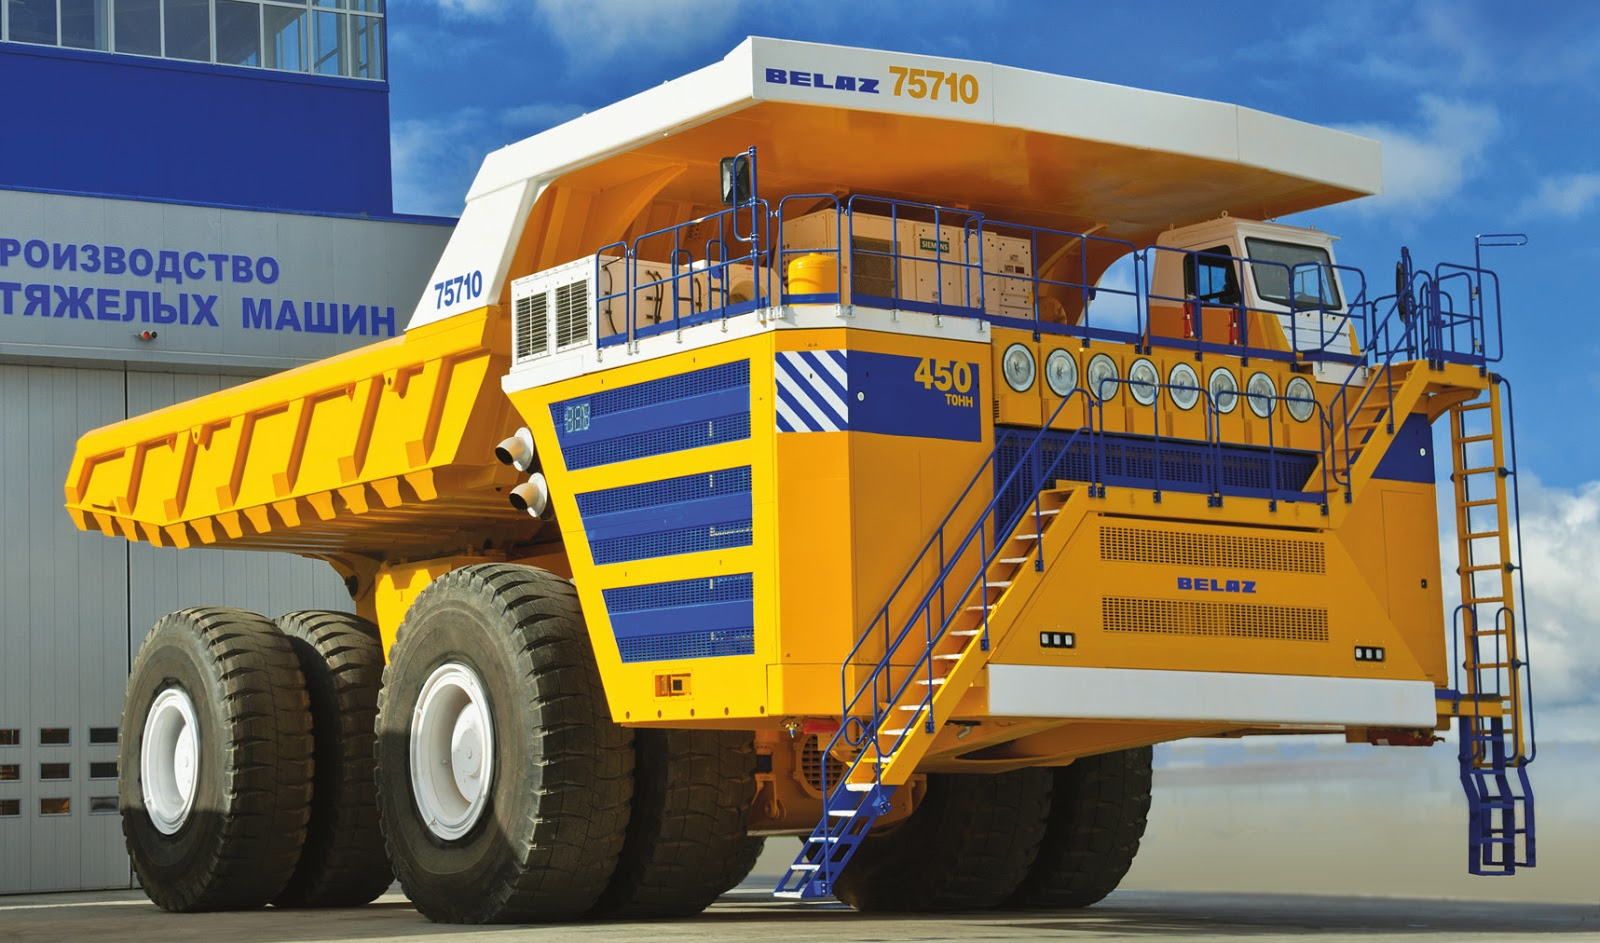 The World S Largest Mining Dump Trucks Mining Engineer S